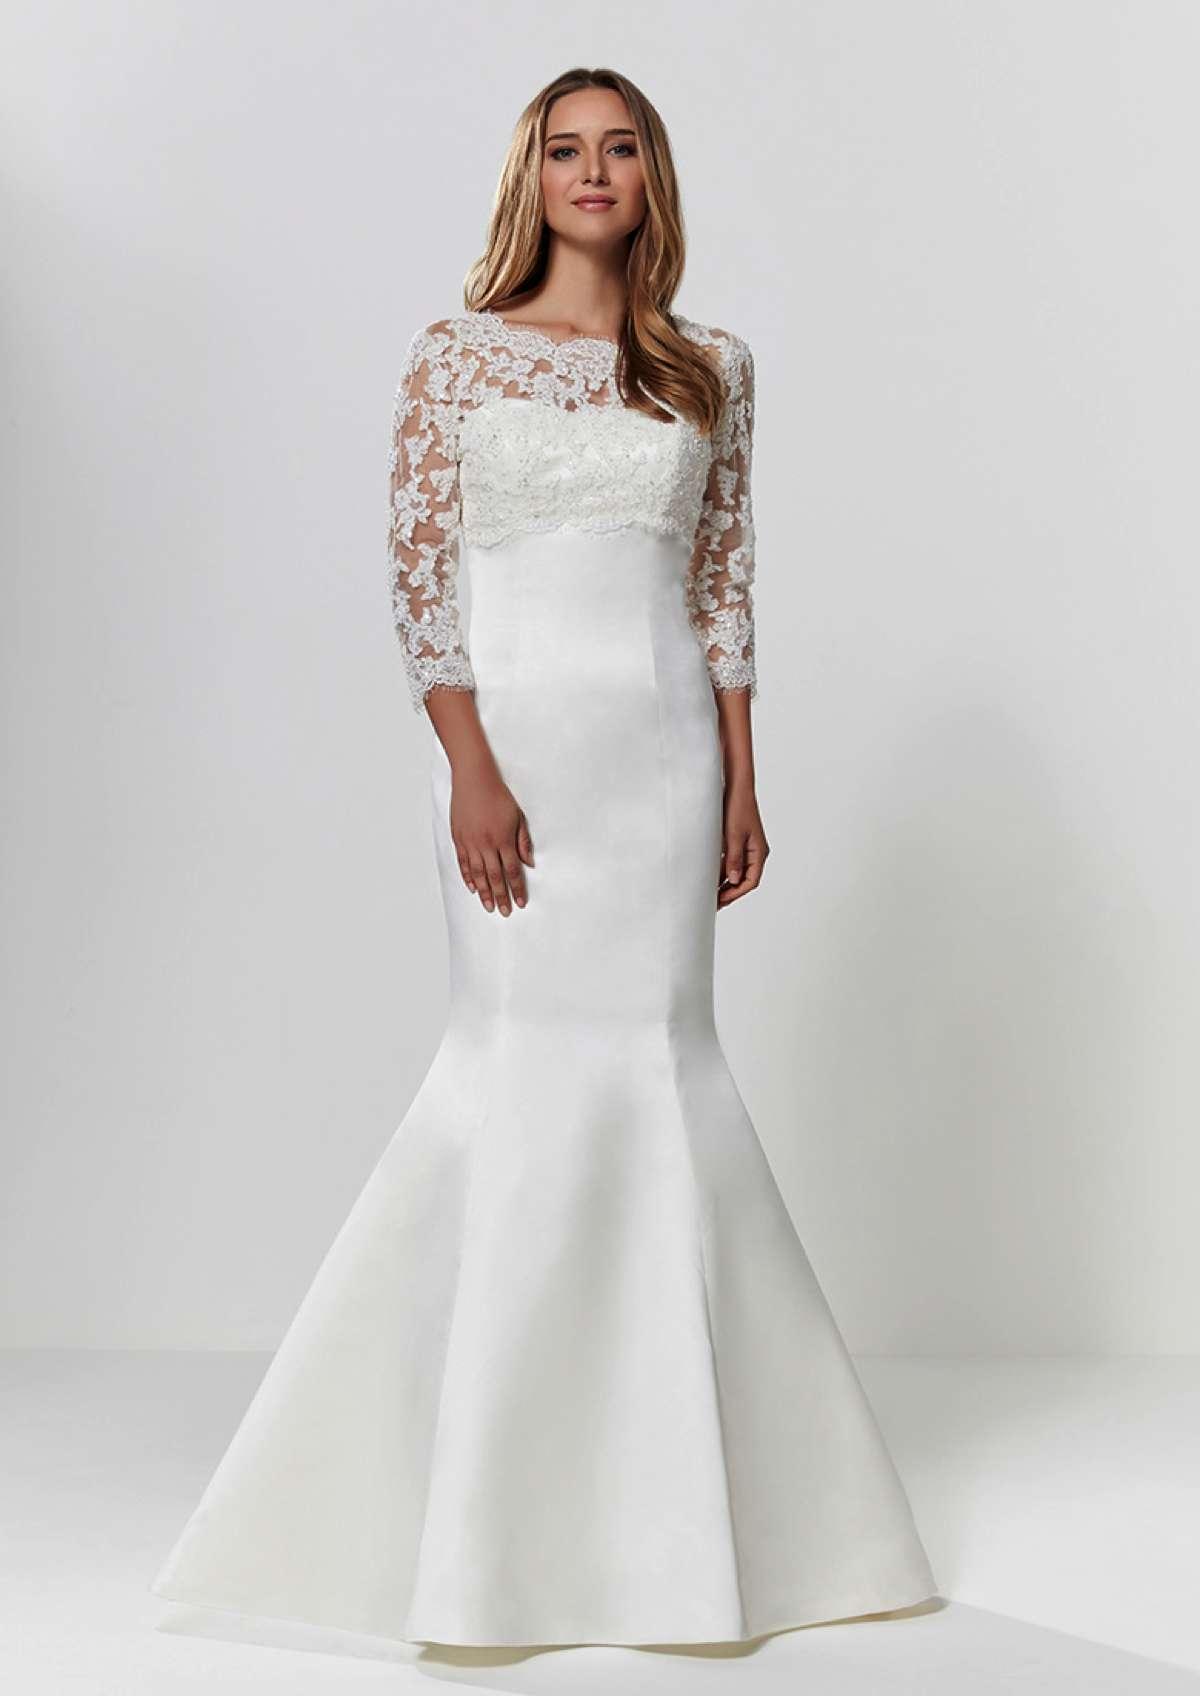 Harrogate Bridal Show Trends - Infinity Bridal